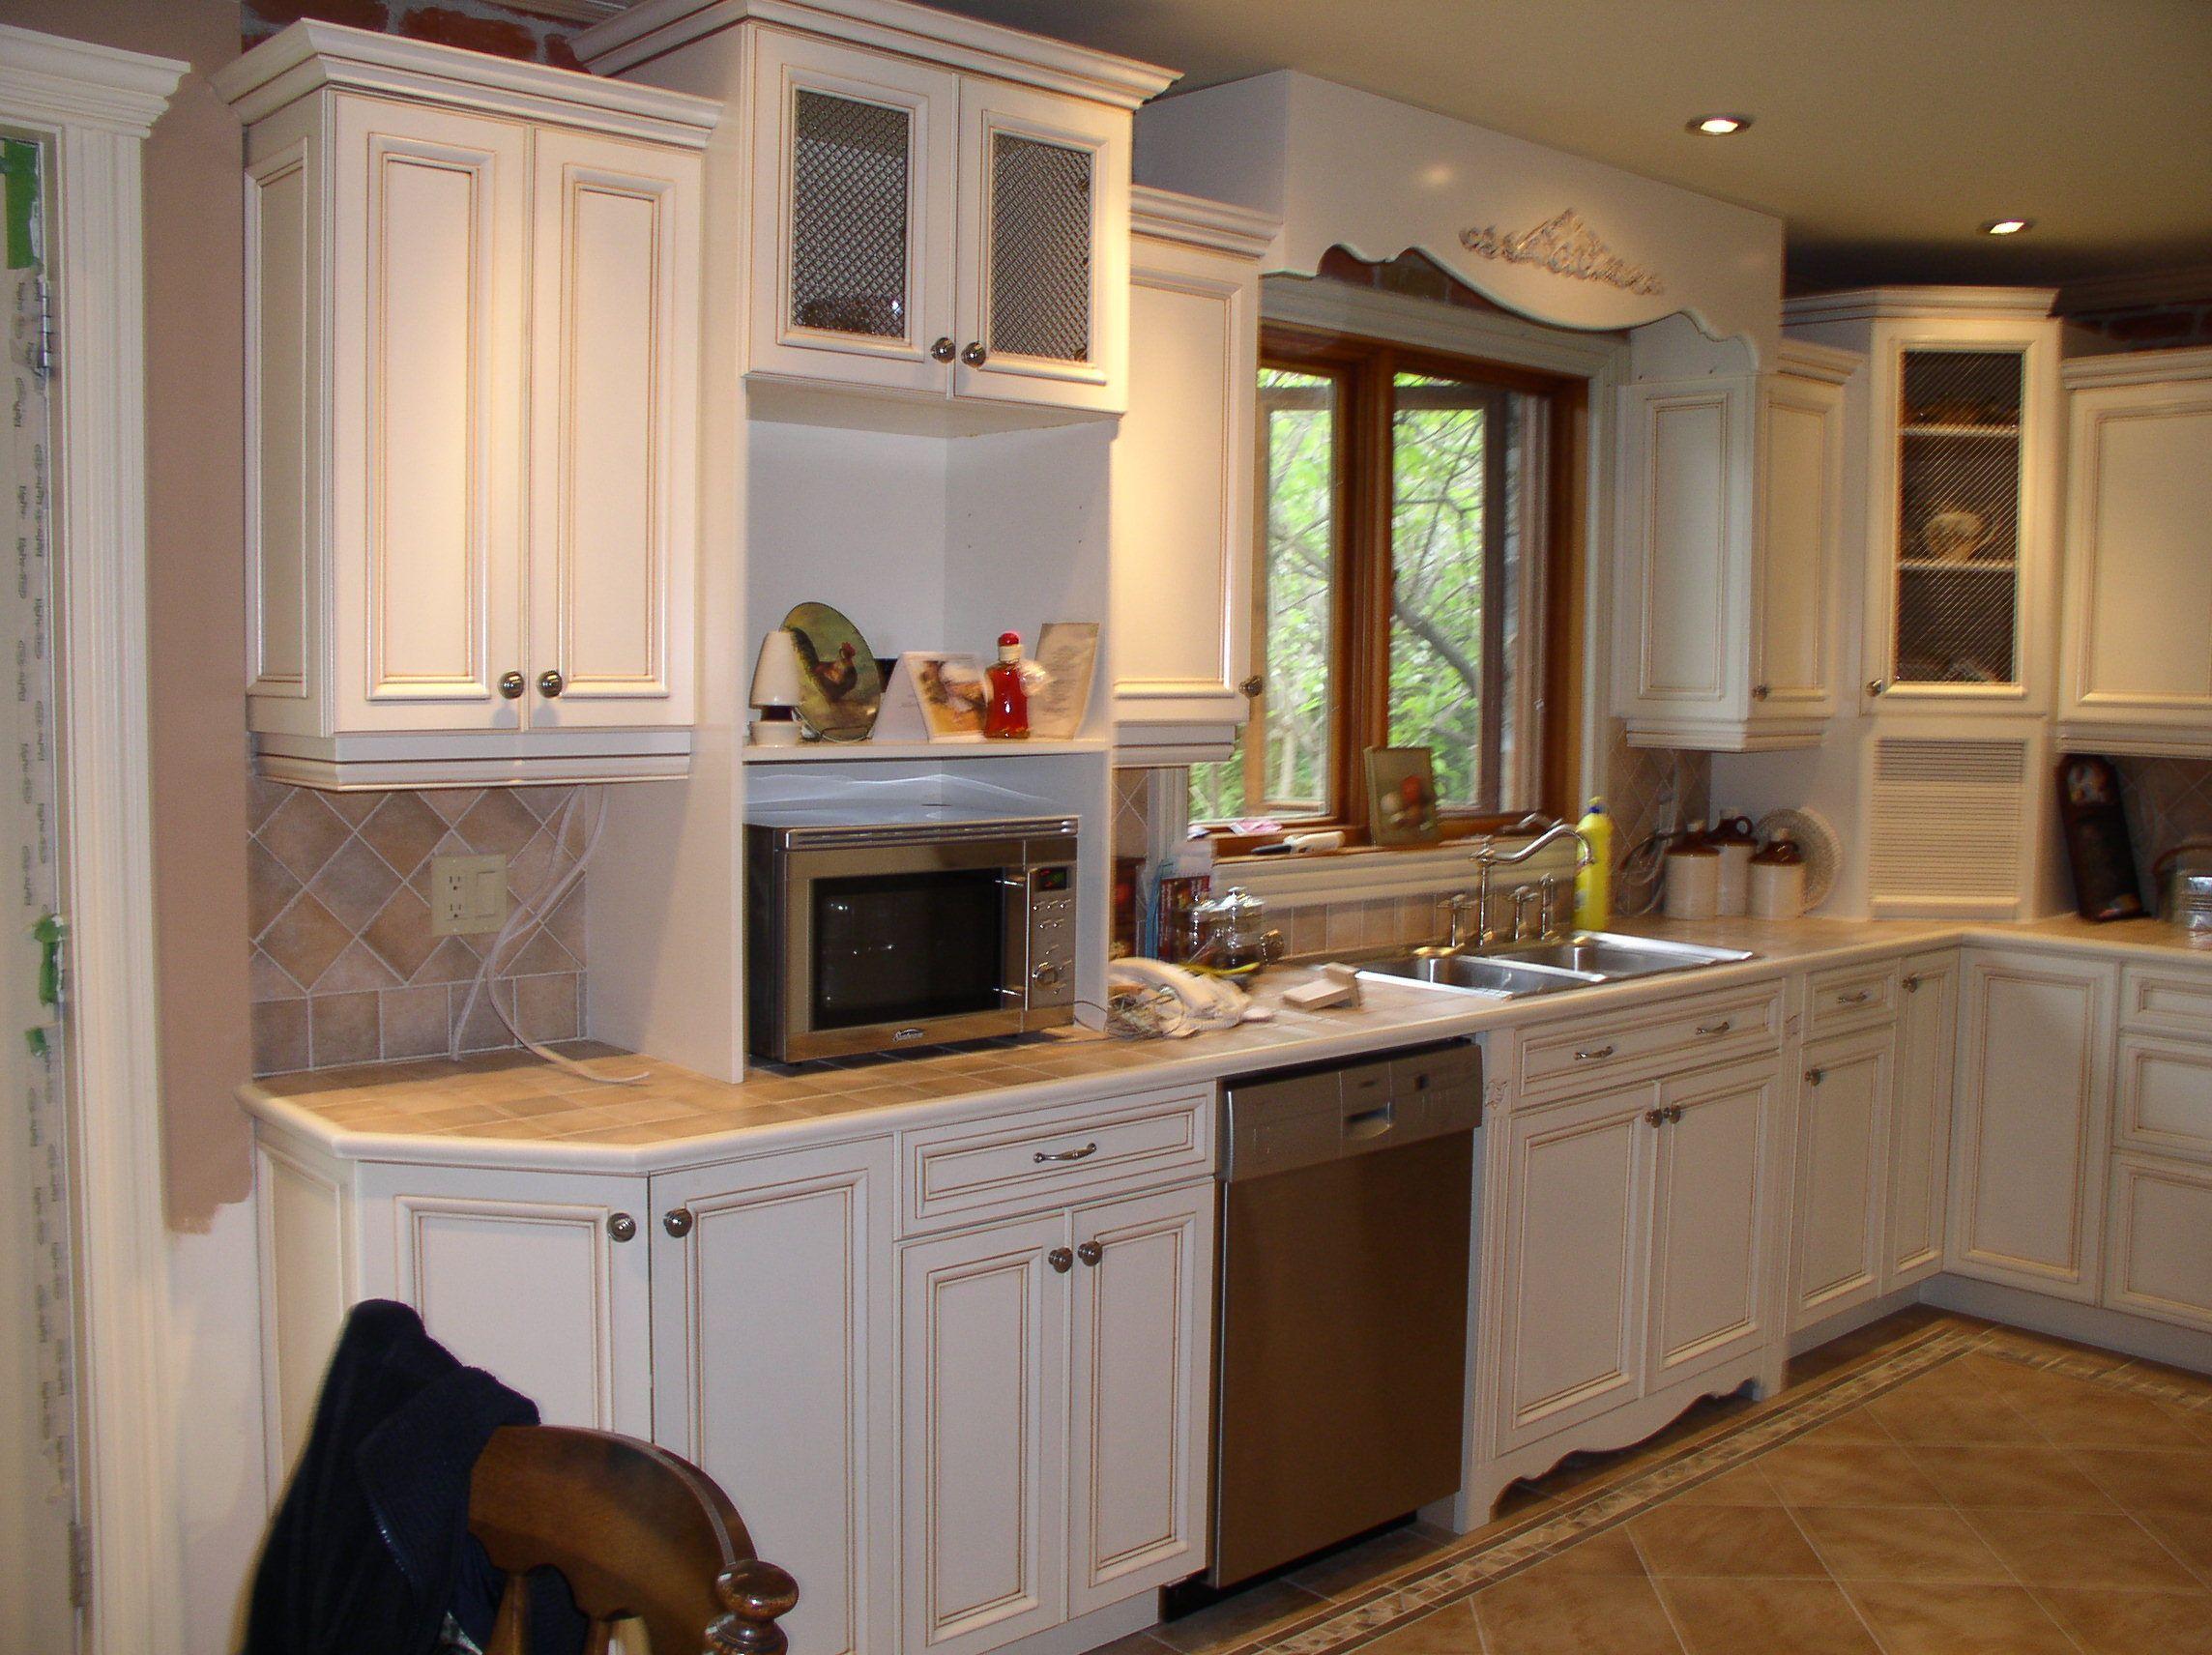 Lovely Google Image Result For Http://www.dimstone.ca/Kitchen%. Kitchen Cabinet  RefacingKitchen RenoMenards ...